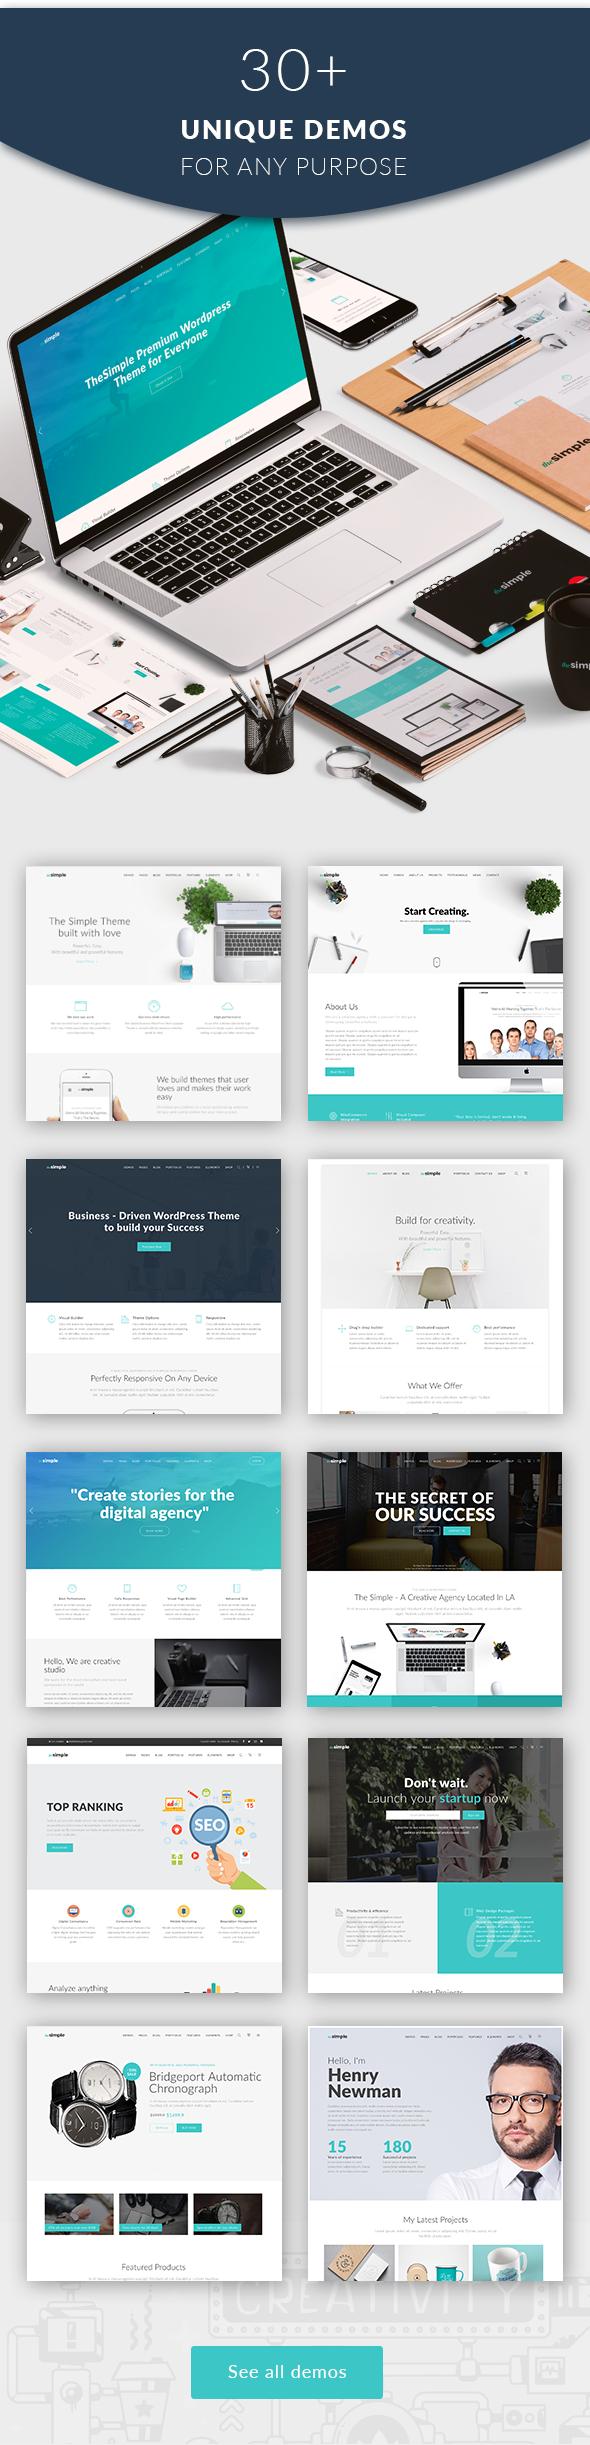 The Simple - Business WordPress Theme - 5